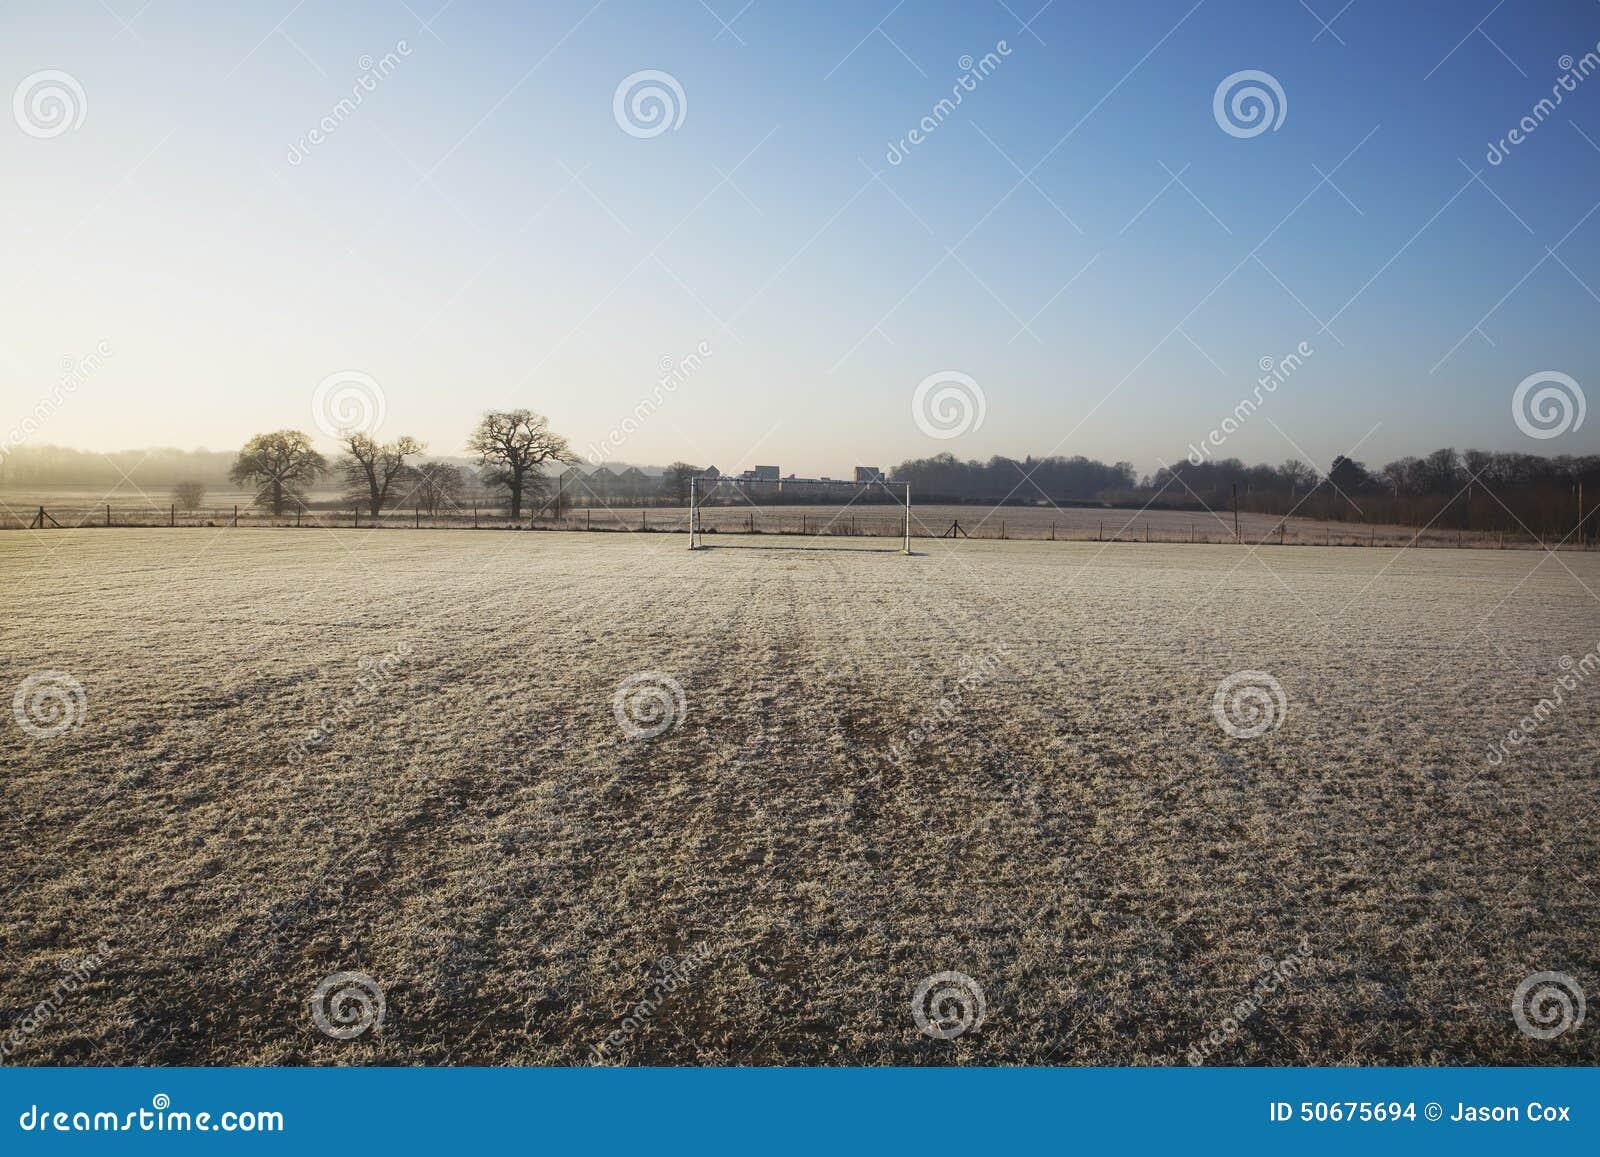 Download 空的橄榄球球场和冷淡的冬天早晨 库存照片. 图片 包括有 户外, 水平, 过帐, 冬天, 体育运动, 目标 - 50675694